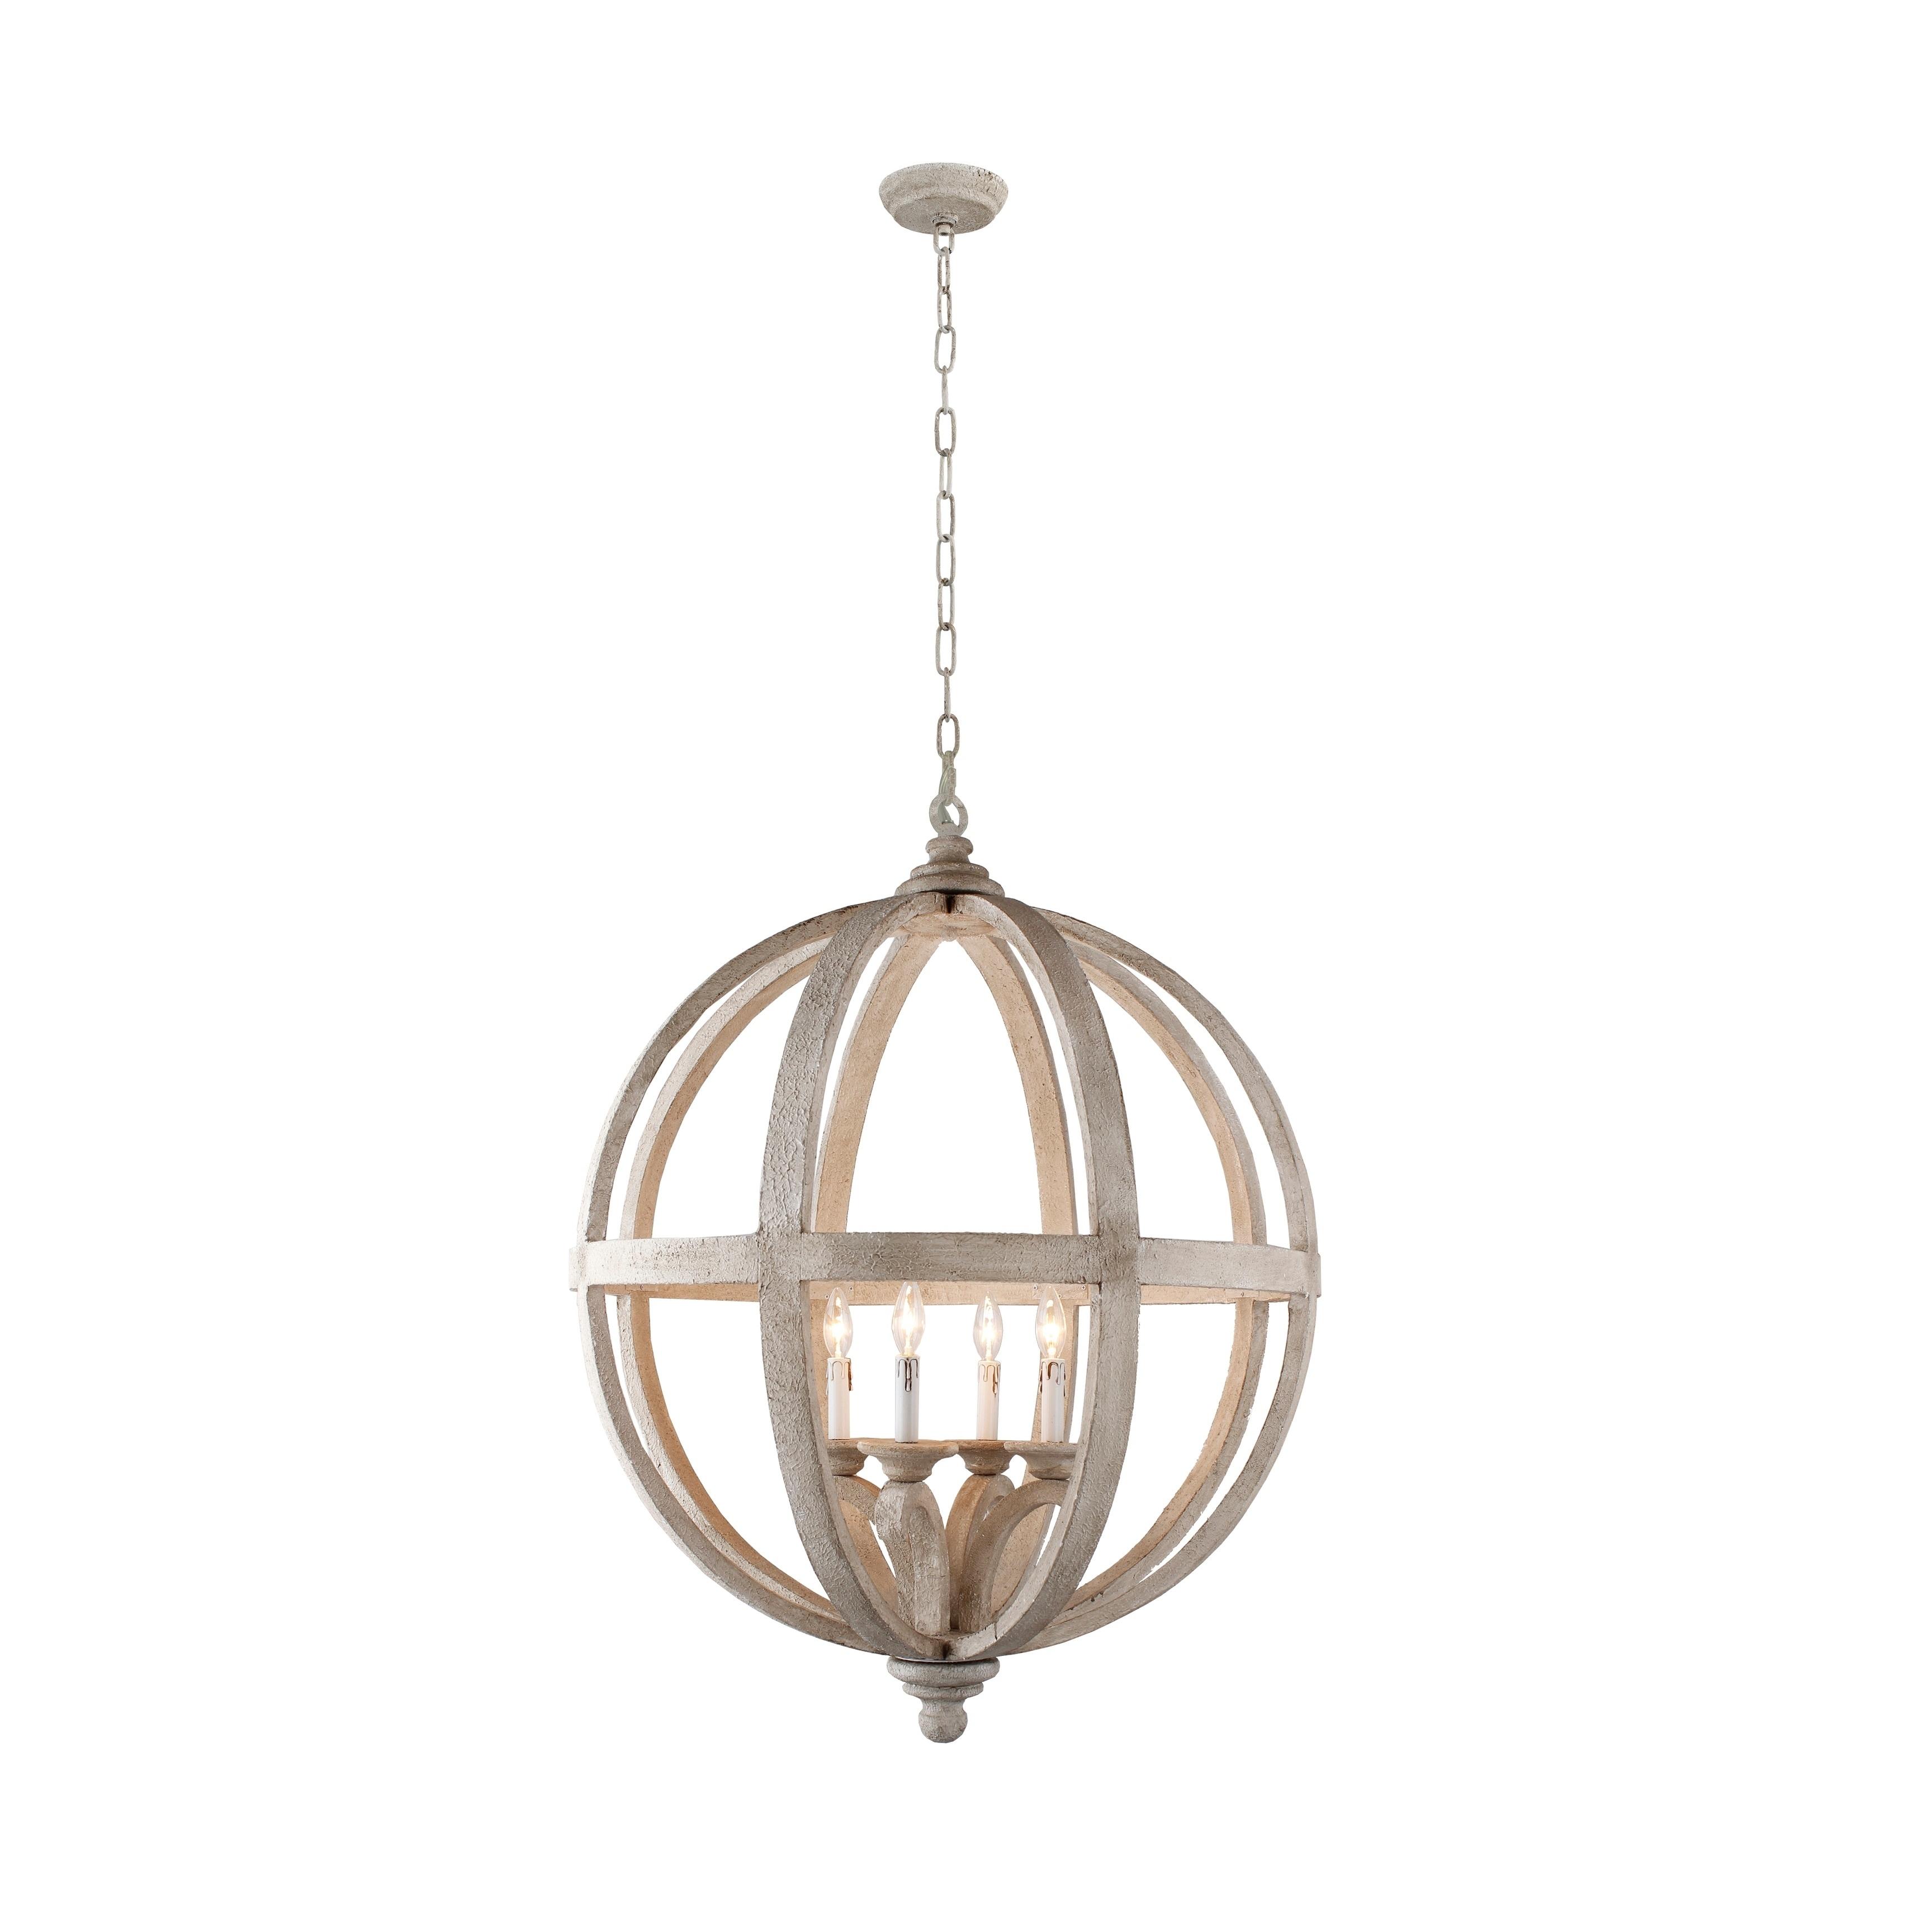 sphere lighting fixture. Y-Decor Hercules 4 Light Chandelier In Wooden Globe Frame - Neutral Free Shipping Today Overstock 18760423 Sphere Lighting Fixture N